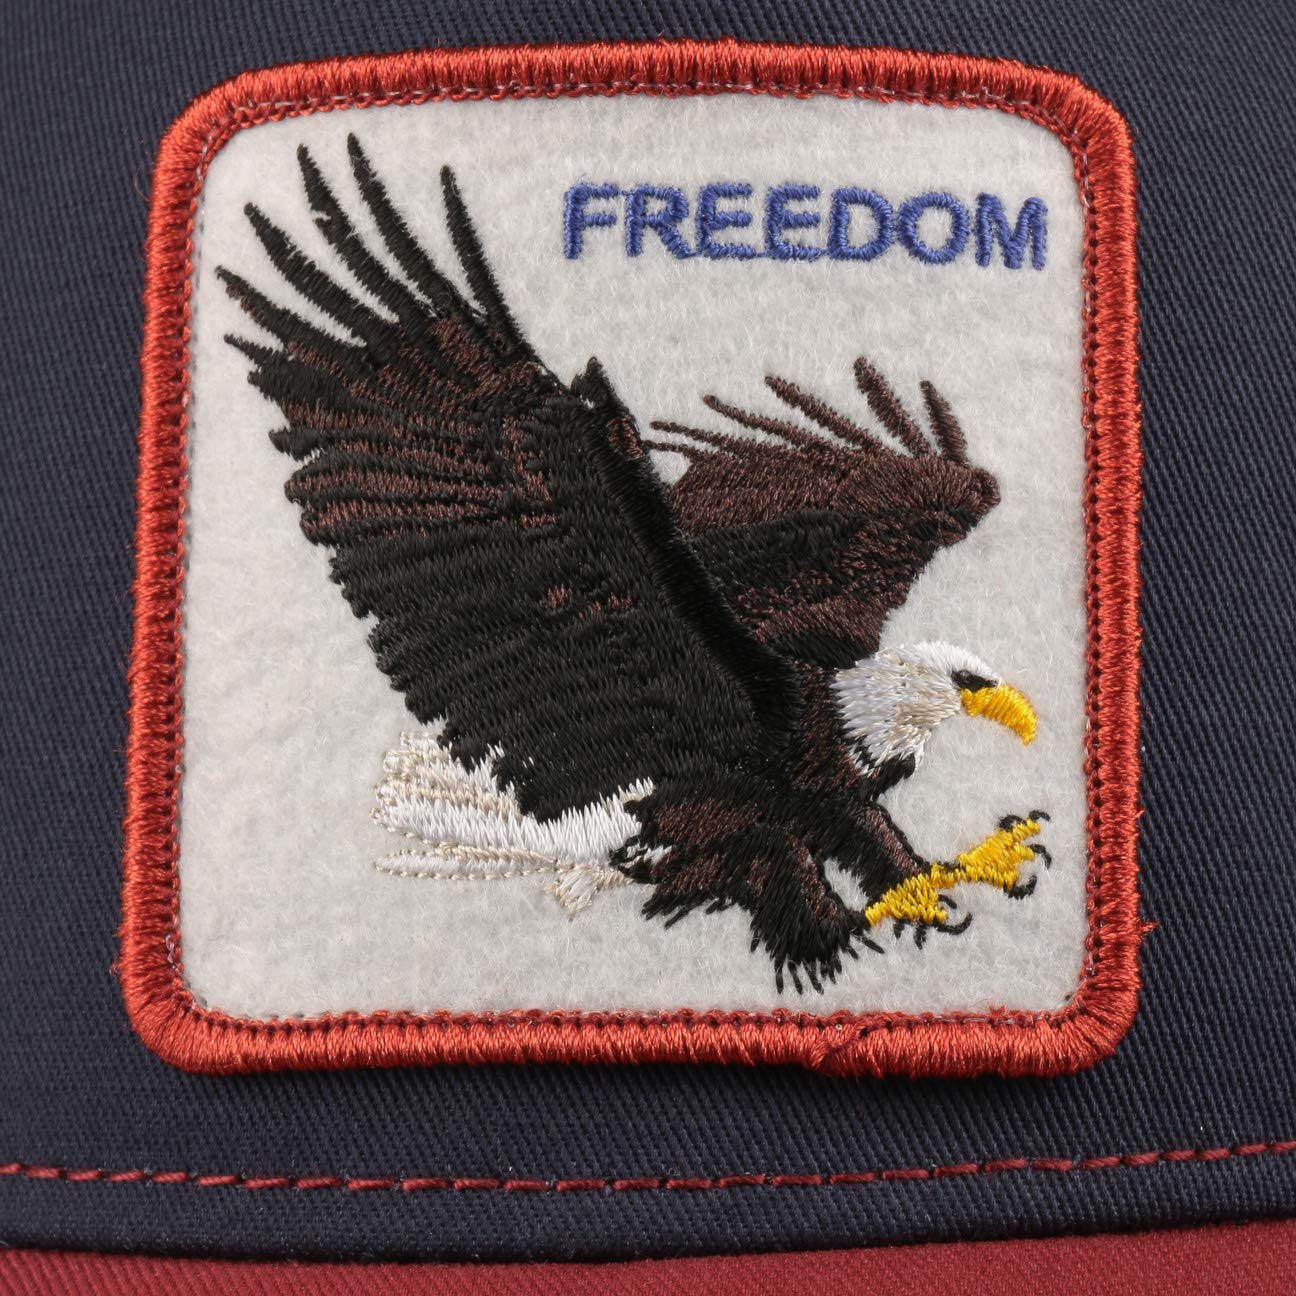 Goorin Bros Cappellino Trucker FreedomBros Mesh cap Curved Brim Baseball